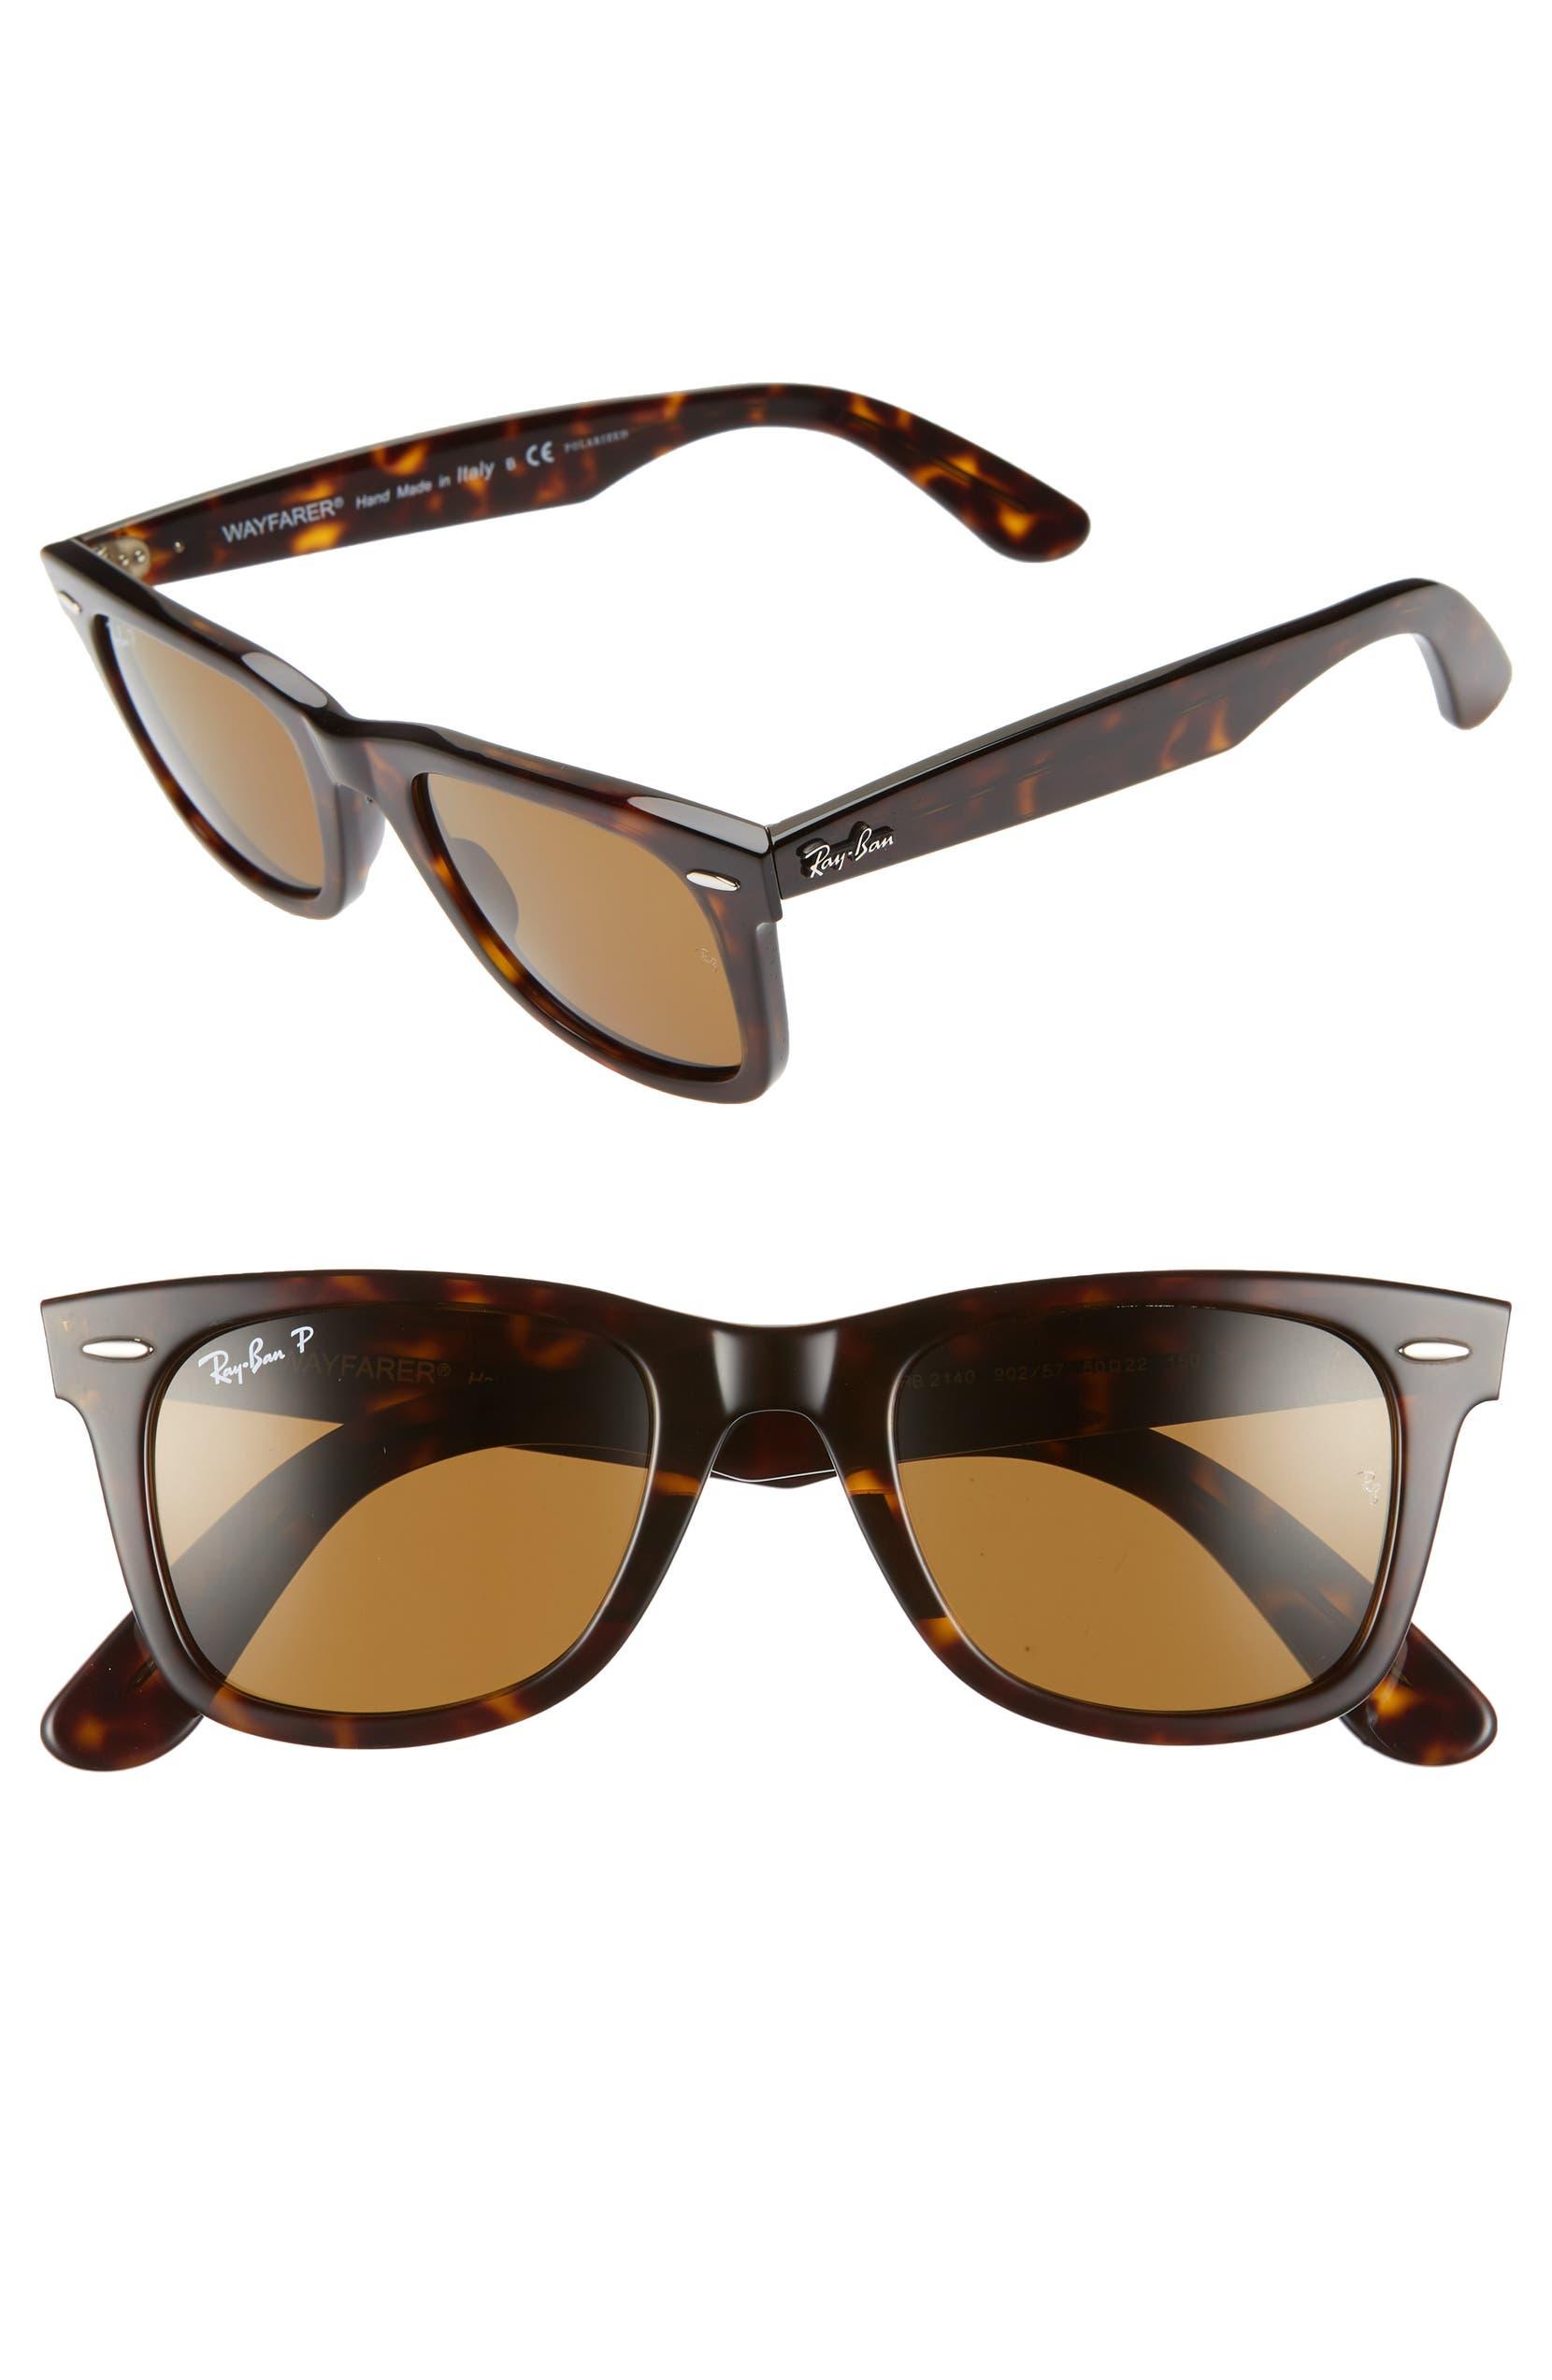 Ray-Ban Standard Classic Wayfarer 50mm Polarized Sunglasses   Nordstrom ba663f6588f9